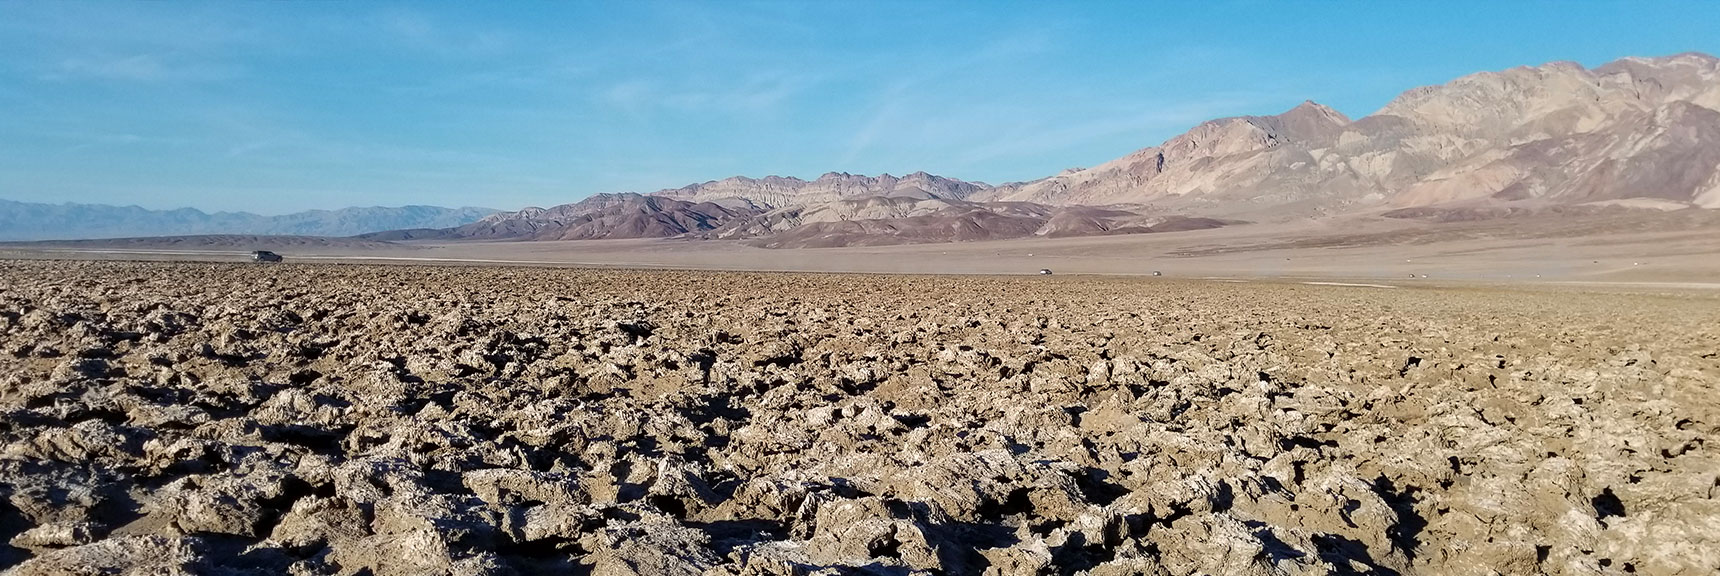 Death Valley National Park Devil's Golf Course November 24th 2018